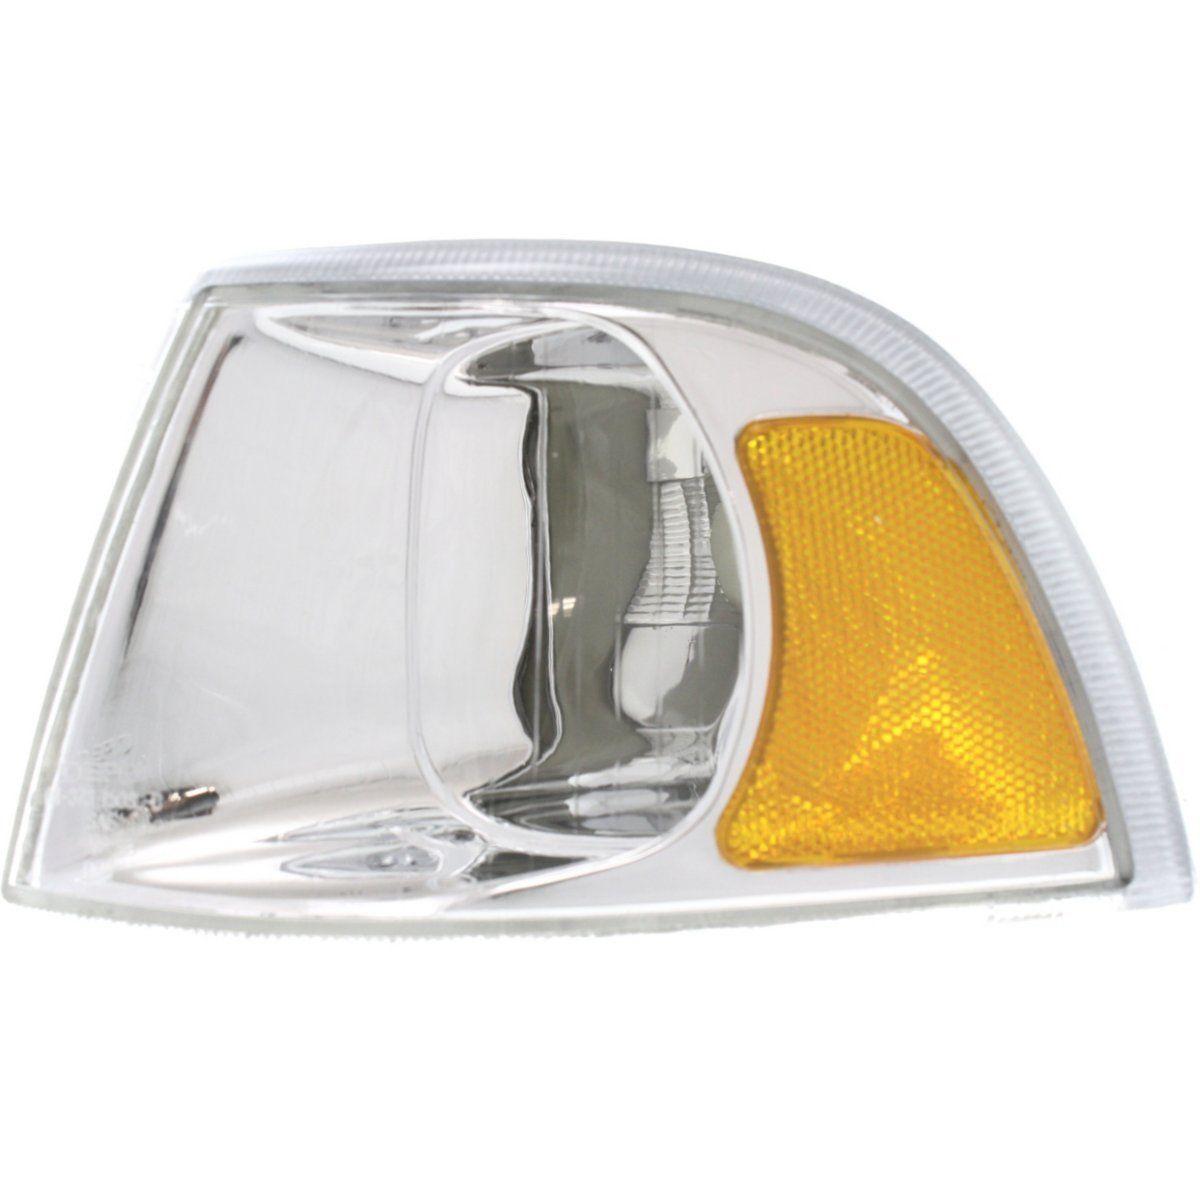 USコーナーライト Corner Light For 2000 Volvo S40 V40 Driver Side Incandescent コーナーライト2000 Volvo S40 V40ドライバーサイド白熱灯